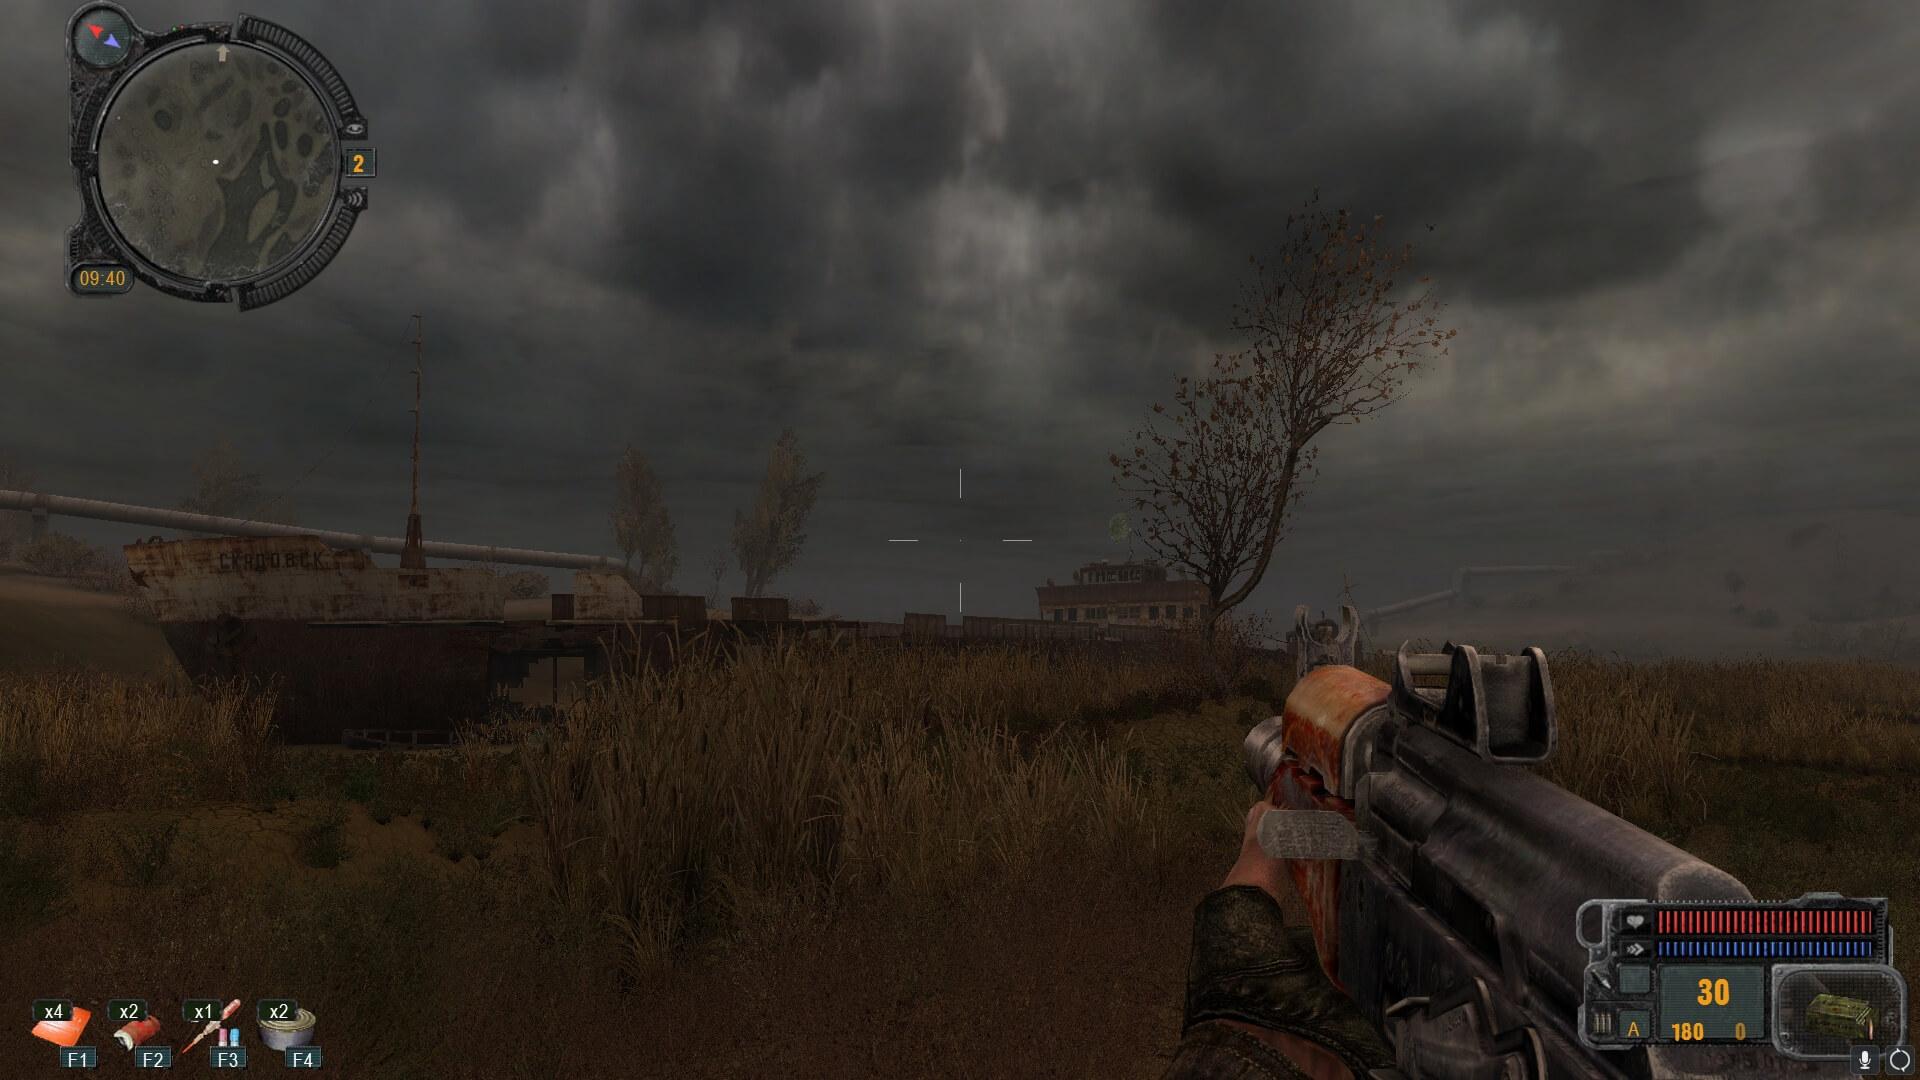 Screenshot aus S.T.A.L.K.E.R. - Call of Pripyat